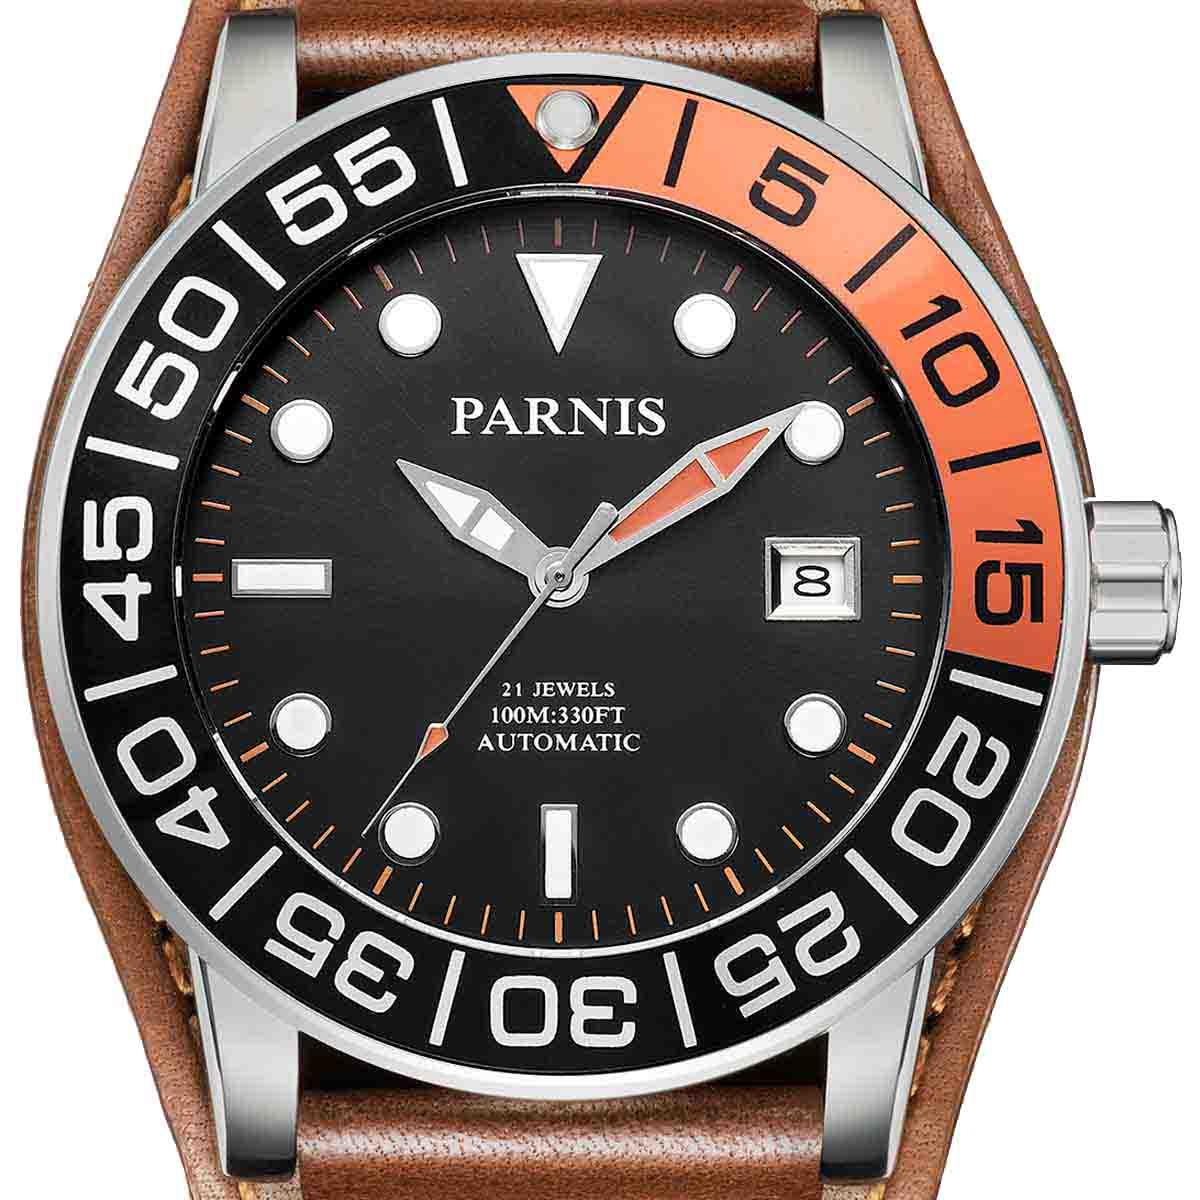 【NEW】PARNIS パーニス 自動巻き 腕時計 [PA6056-S3AL-SVbkBR] 並行輸入品 純正ケース メーカー保証12ヶ月